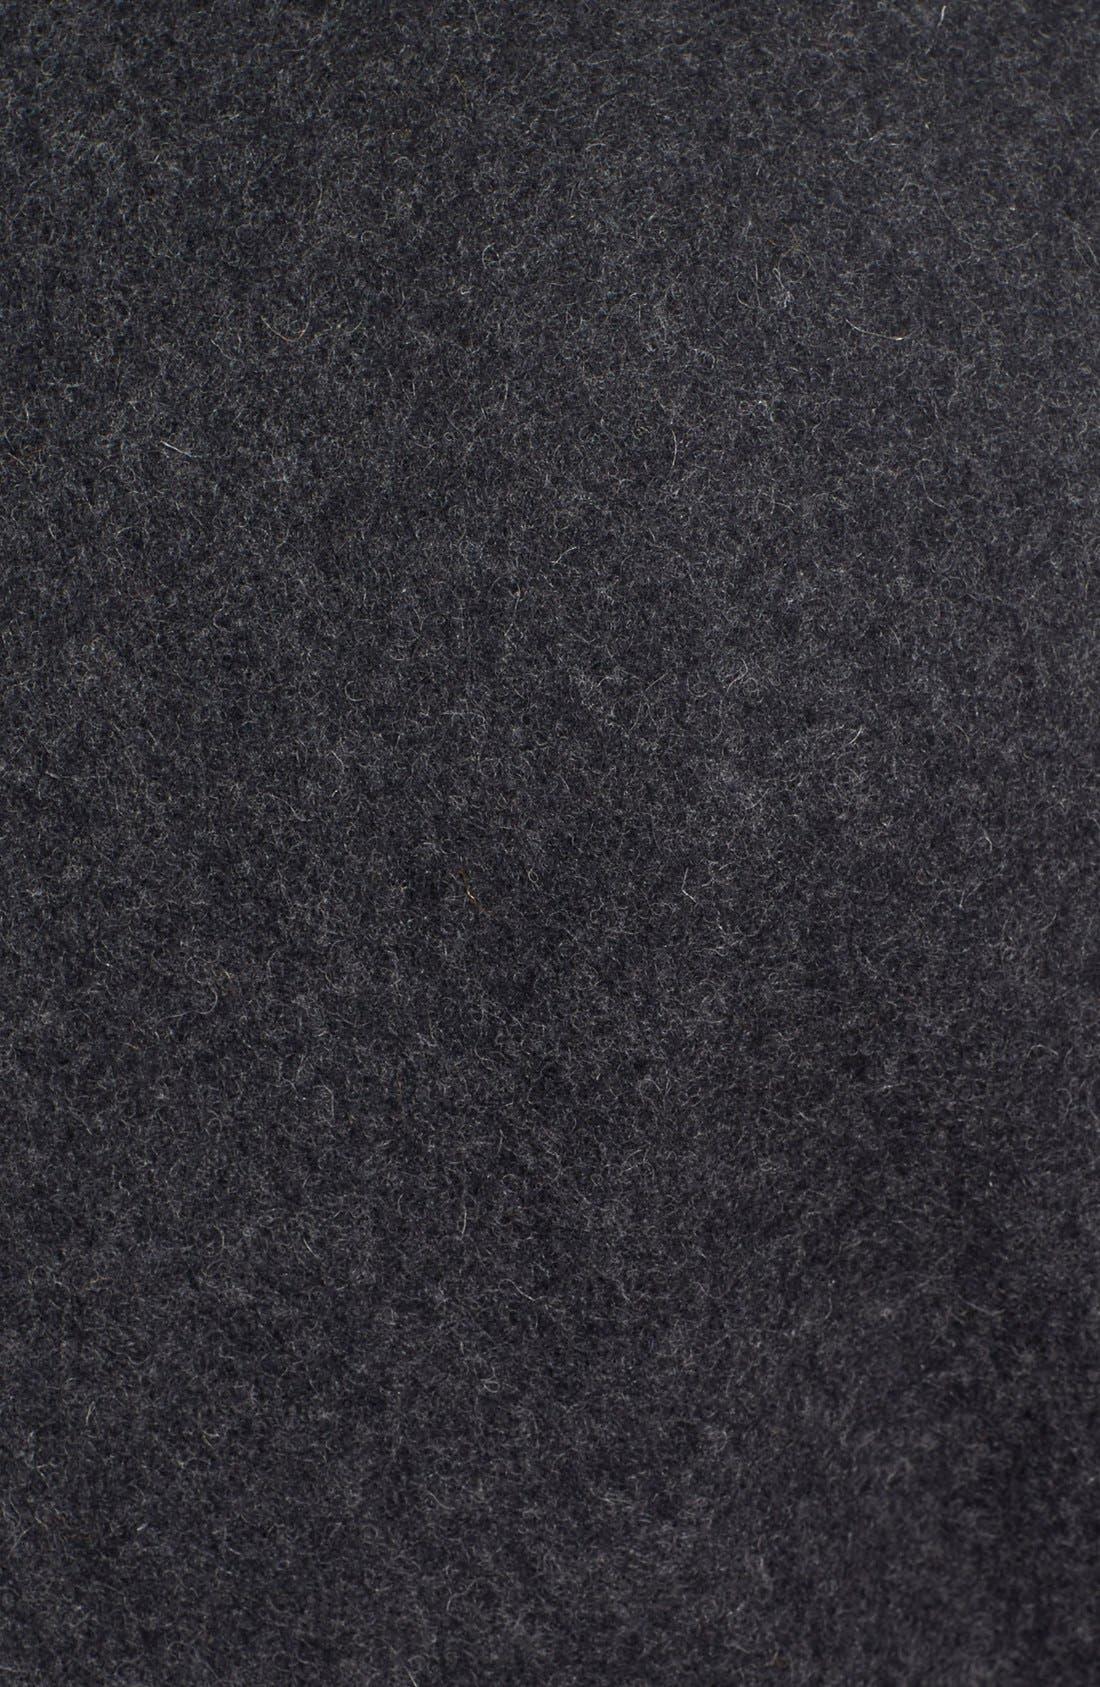 Slim Fit Wool Blend Peacoat,                             Alternate thumbnail 5, color,                             Dark Oxford Grey